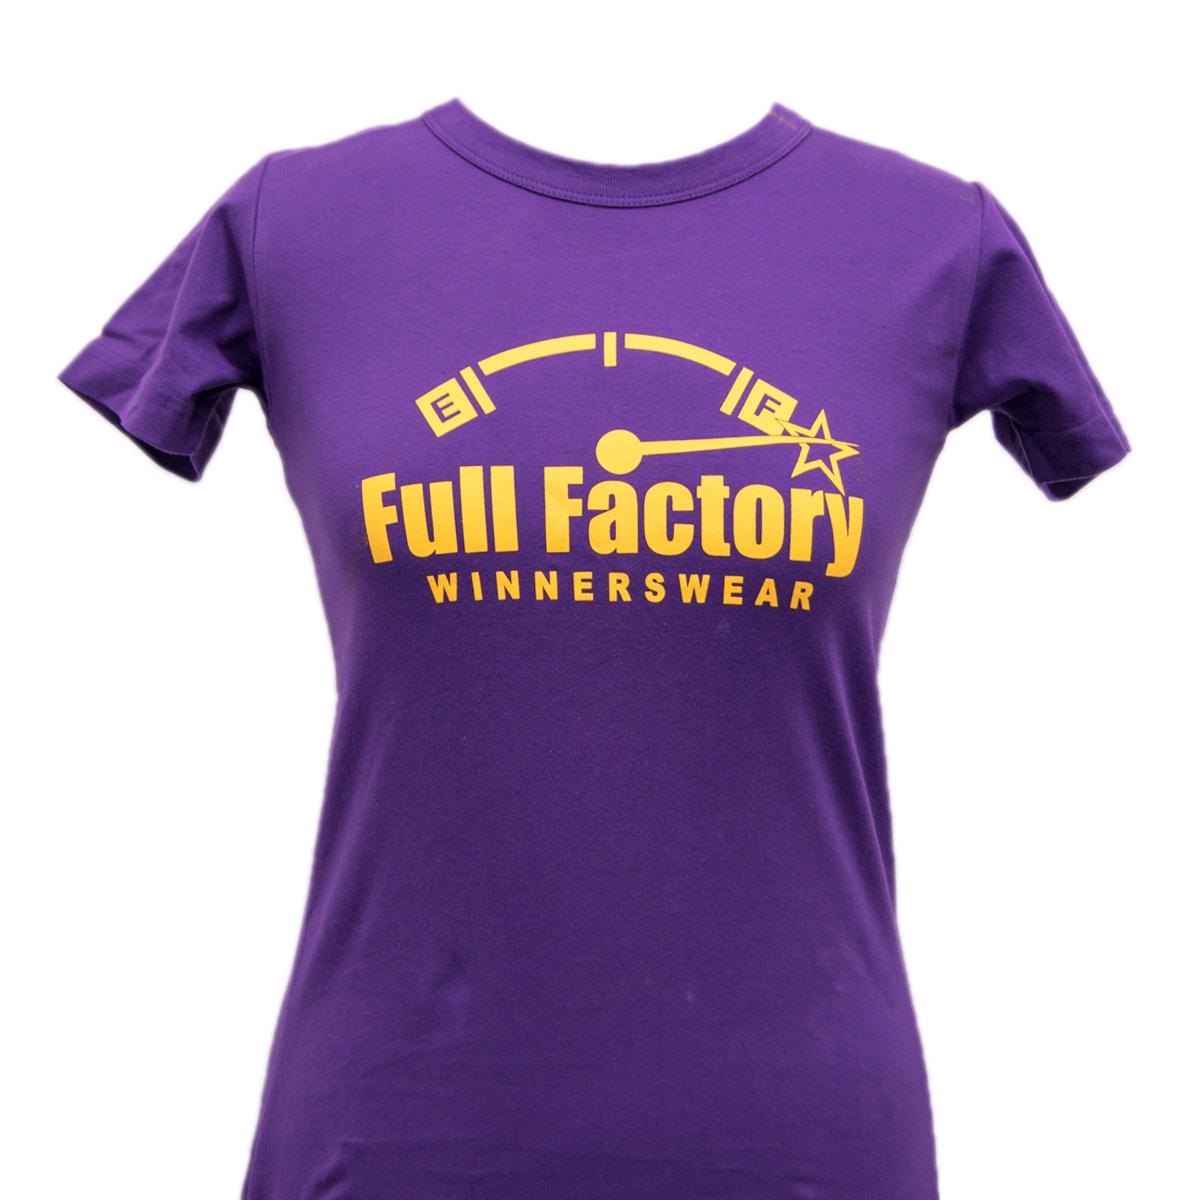 Ladies Full Factory Purple & Yellow T-Shirt Image